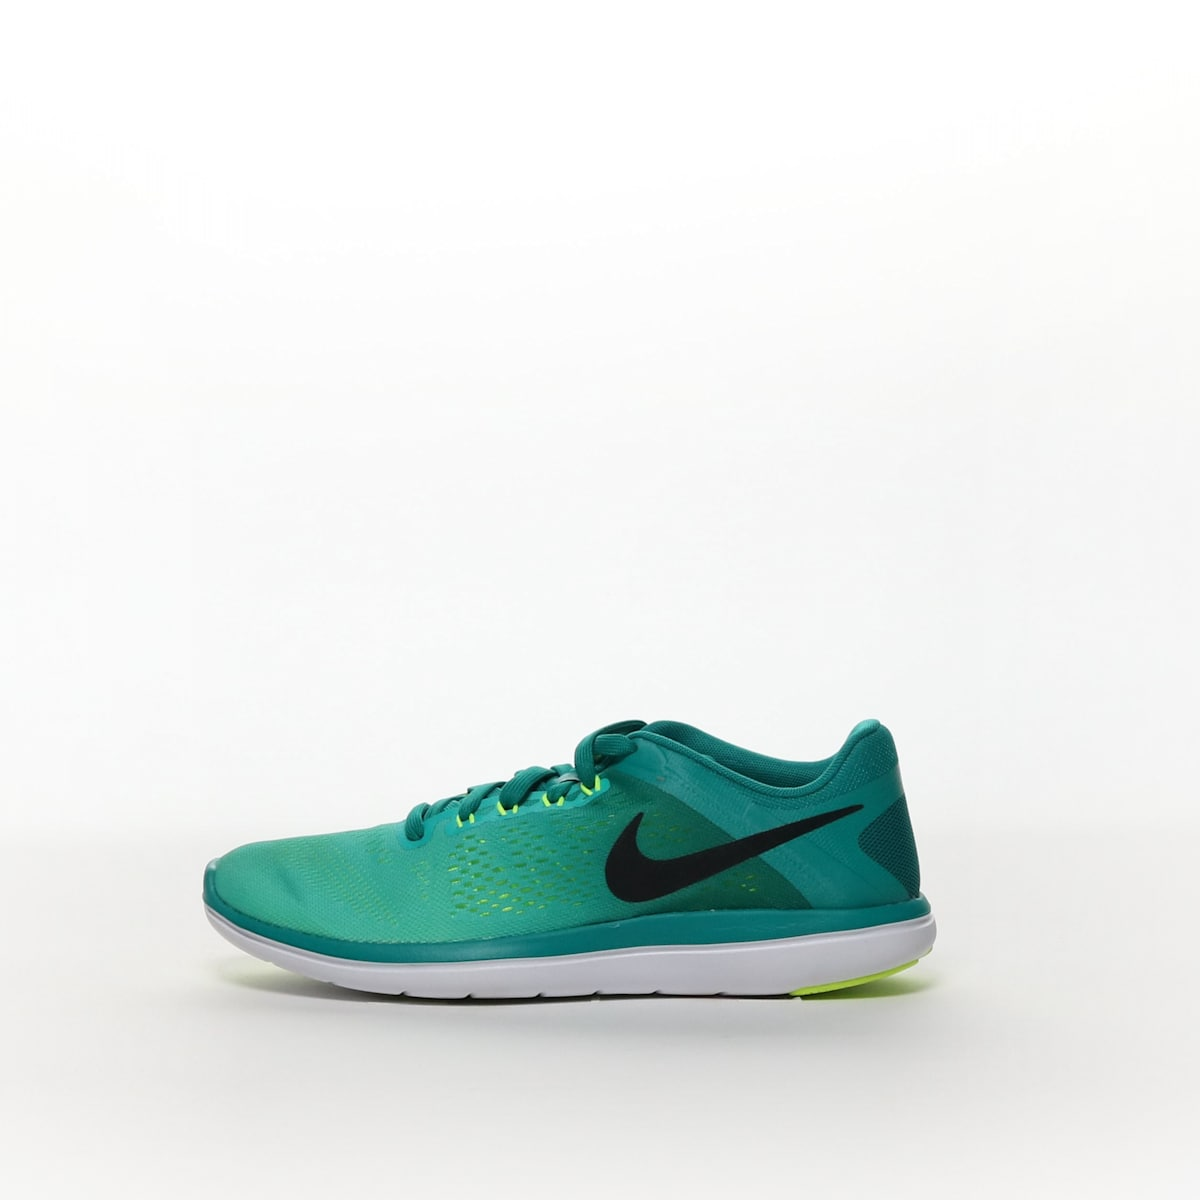 77172a88 Men's Nike Flex 2016 RN Running Shoe - RIOTEA/BLACK – Resku